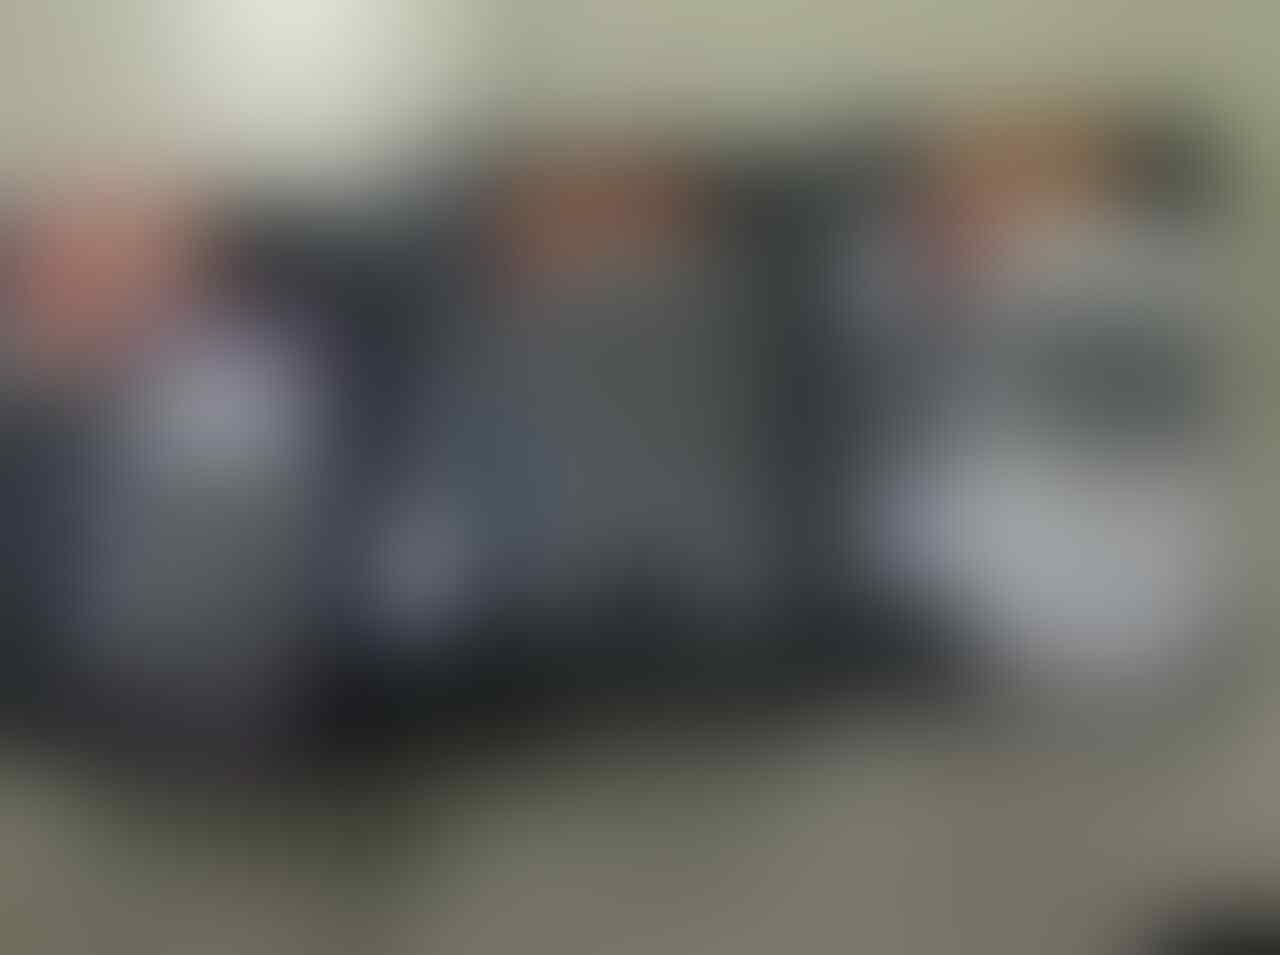 BLACKBERRY 9330 GARANSI 2TAHUN BANDUNG BONUS